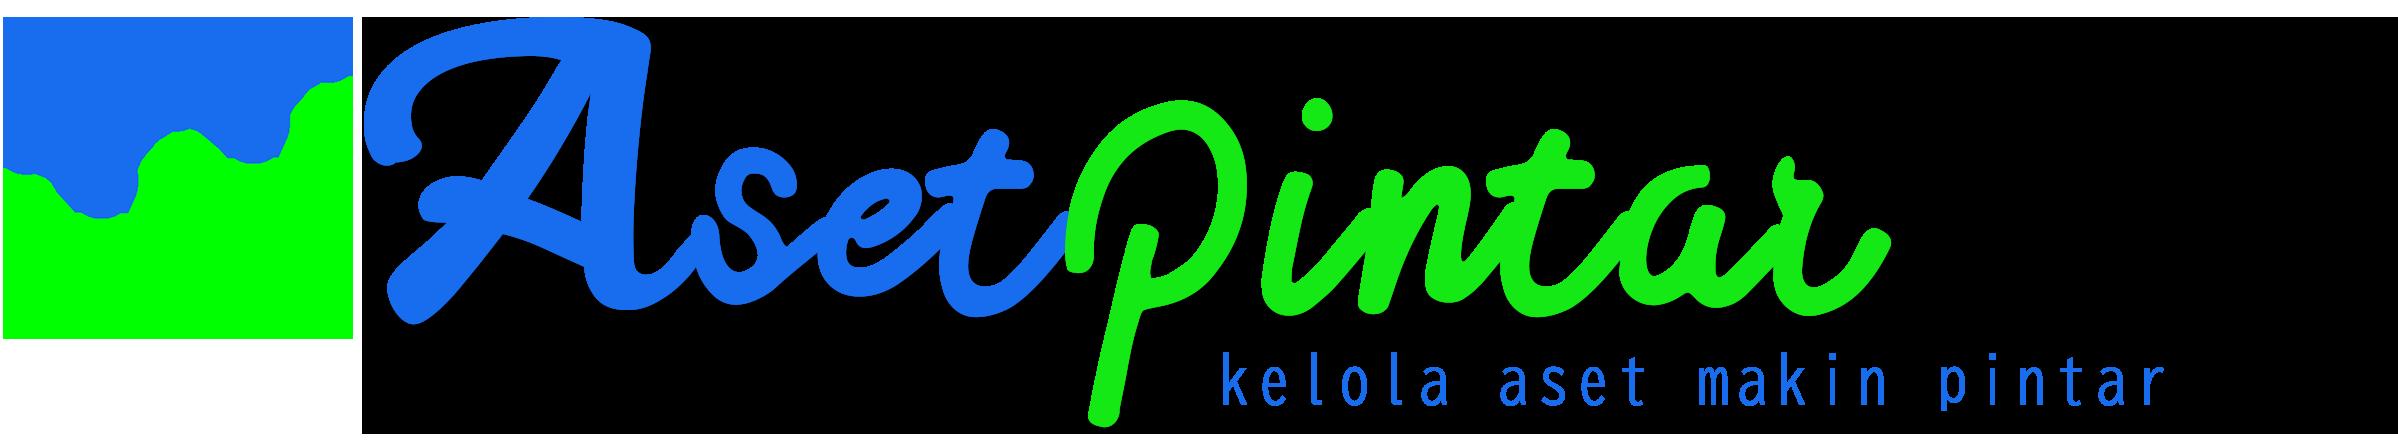 asetpintar.com